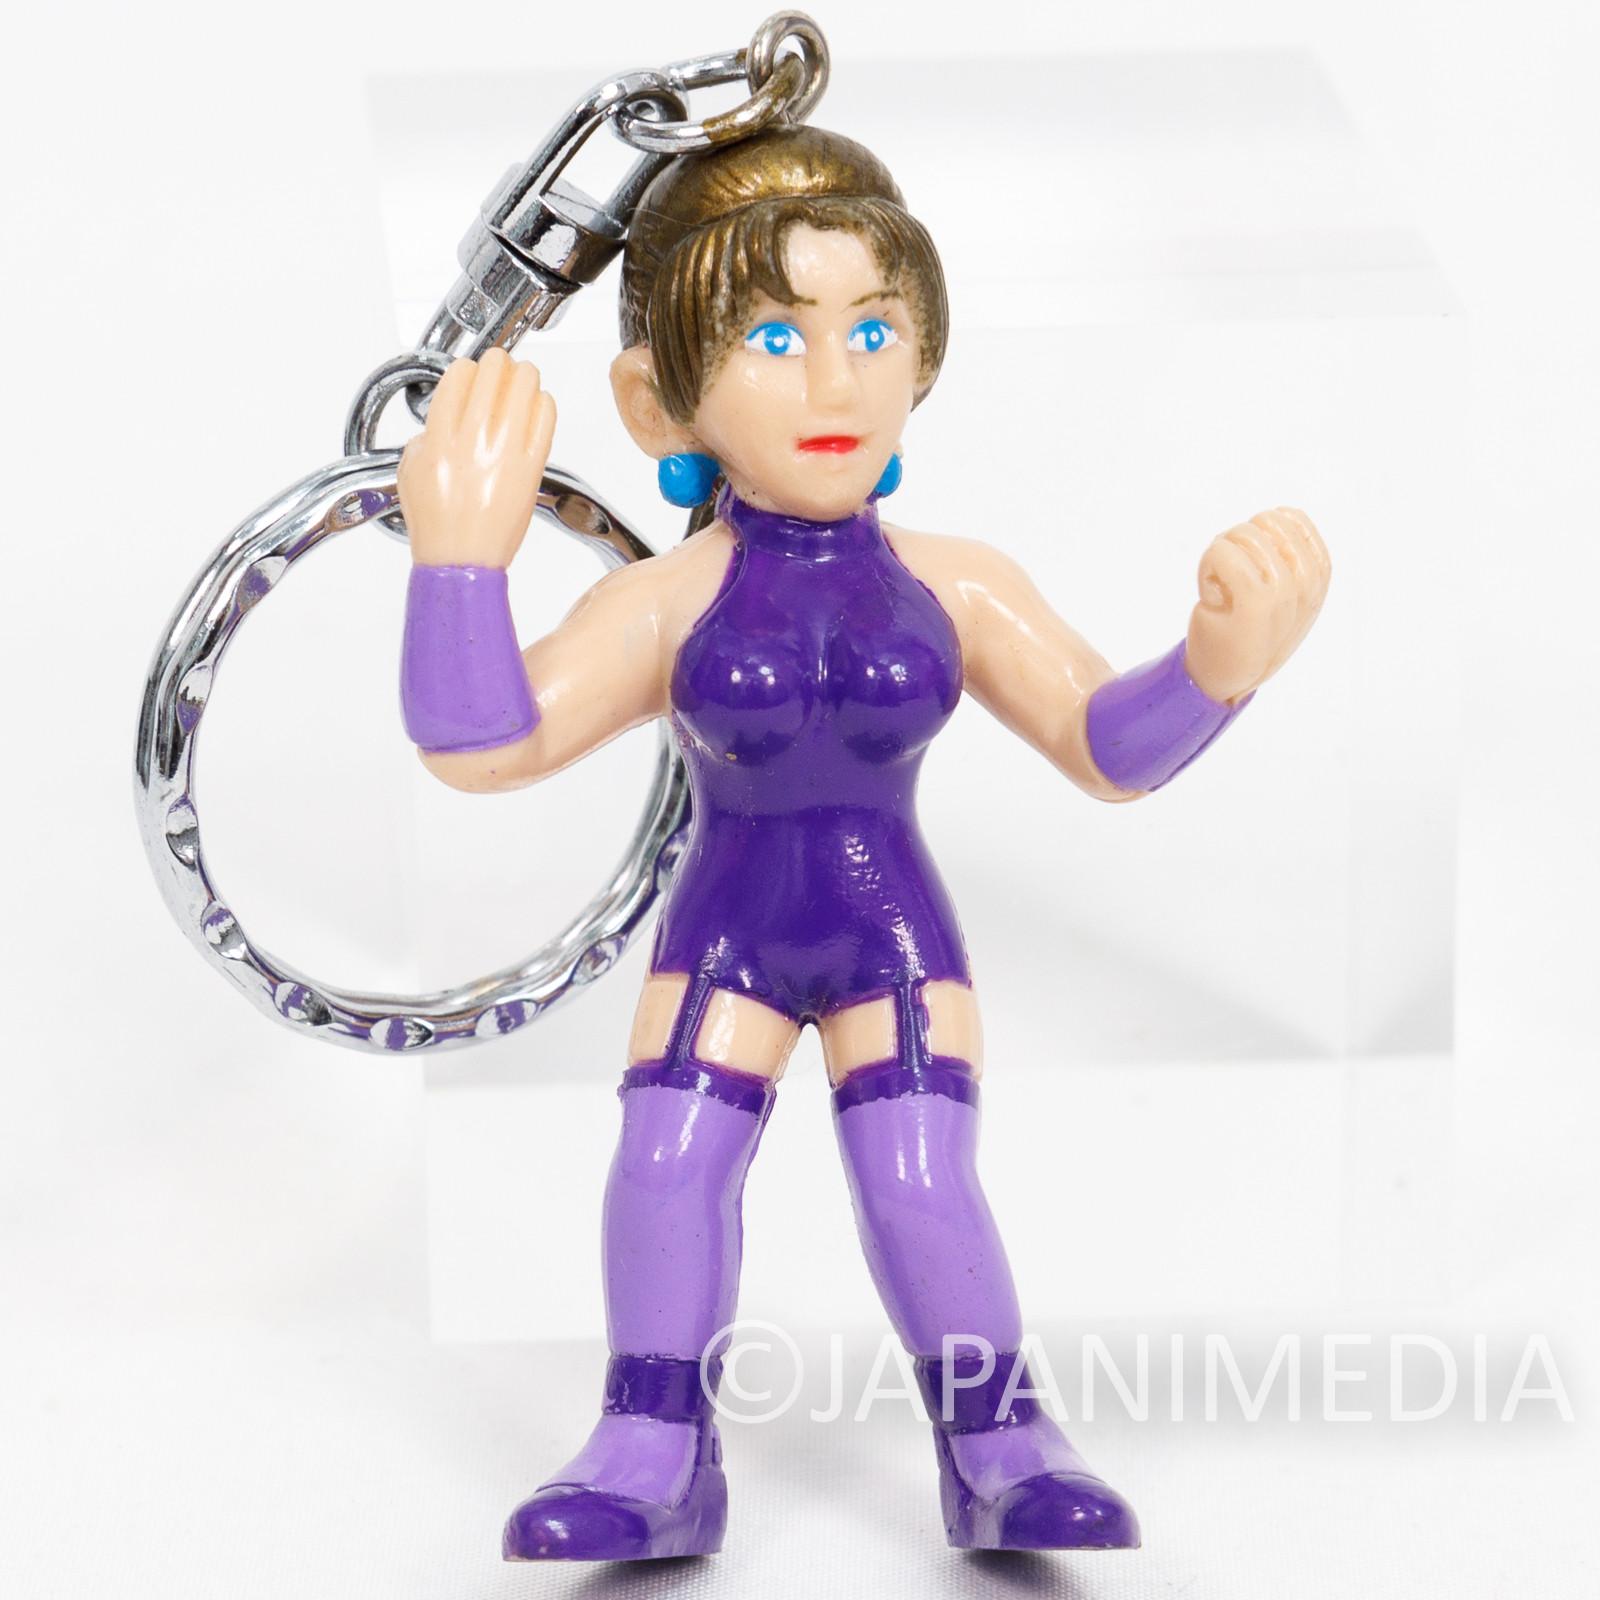 Retro RARE! Nina Williams Mishima Figure Keychain Namco JAPAN GAME